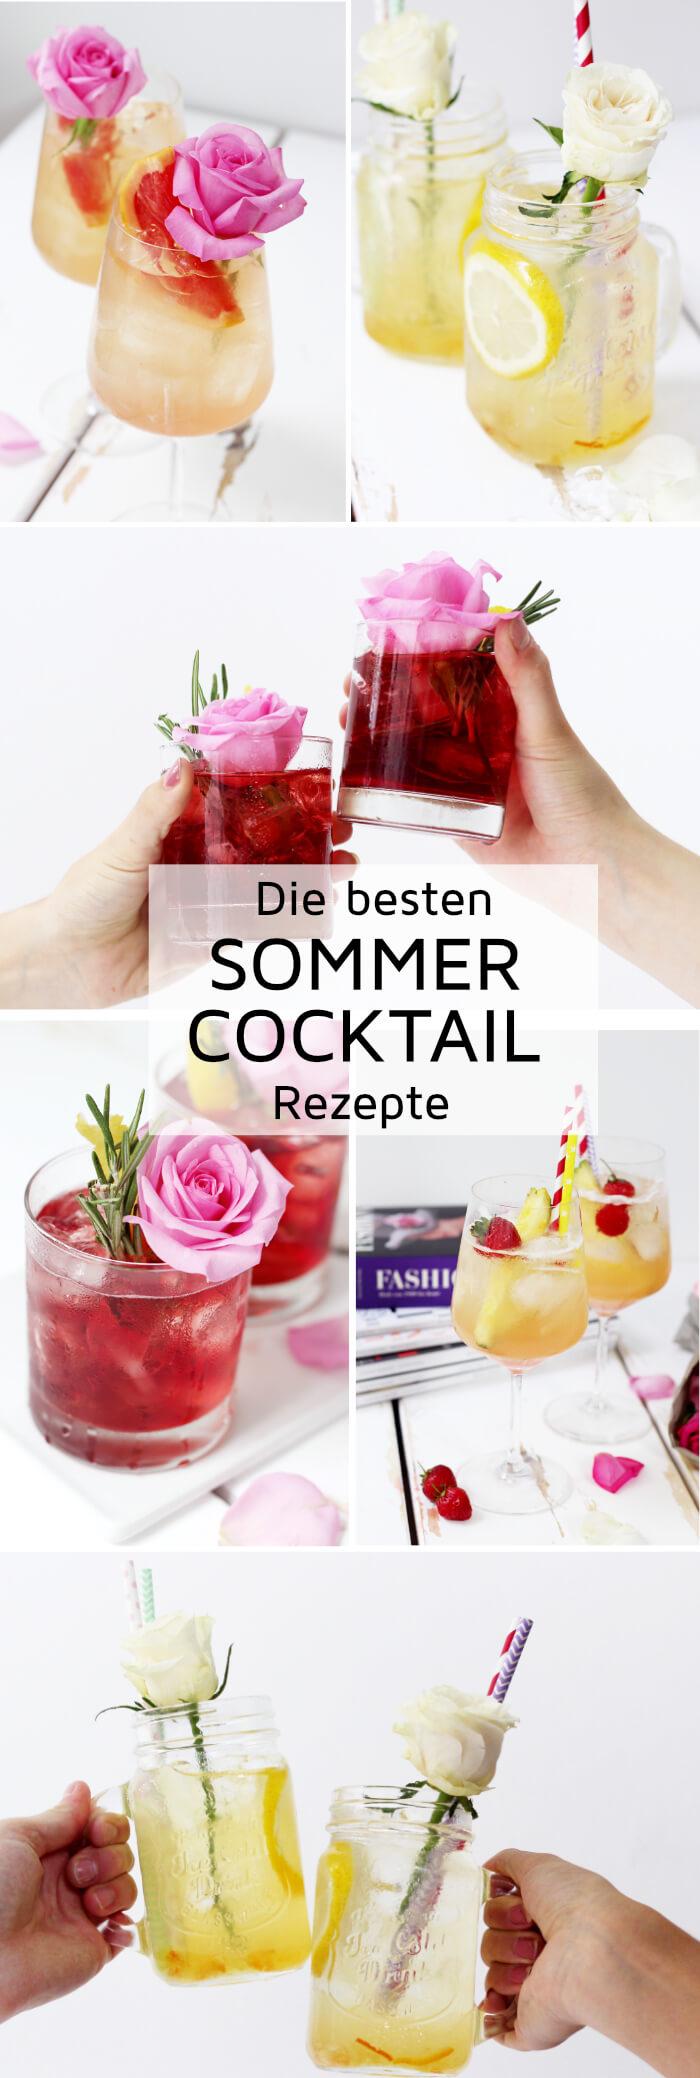 die-besten-sommer-cocktail-rezepte-diy-blog